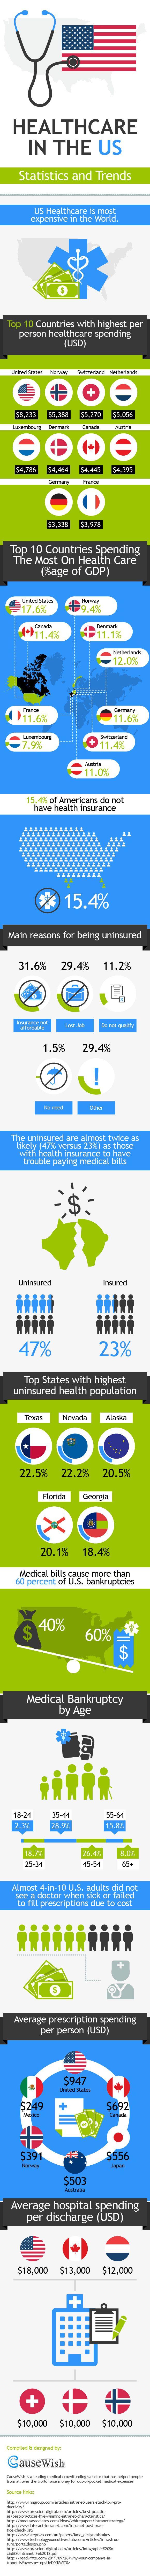 #Healthcare in the U.S.: Statistics & trends [infographic].